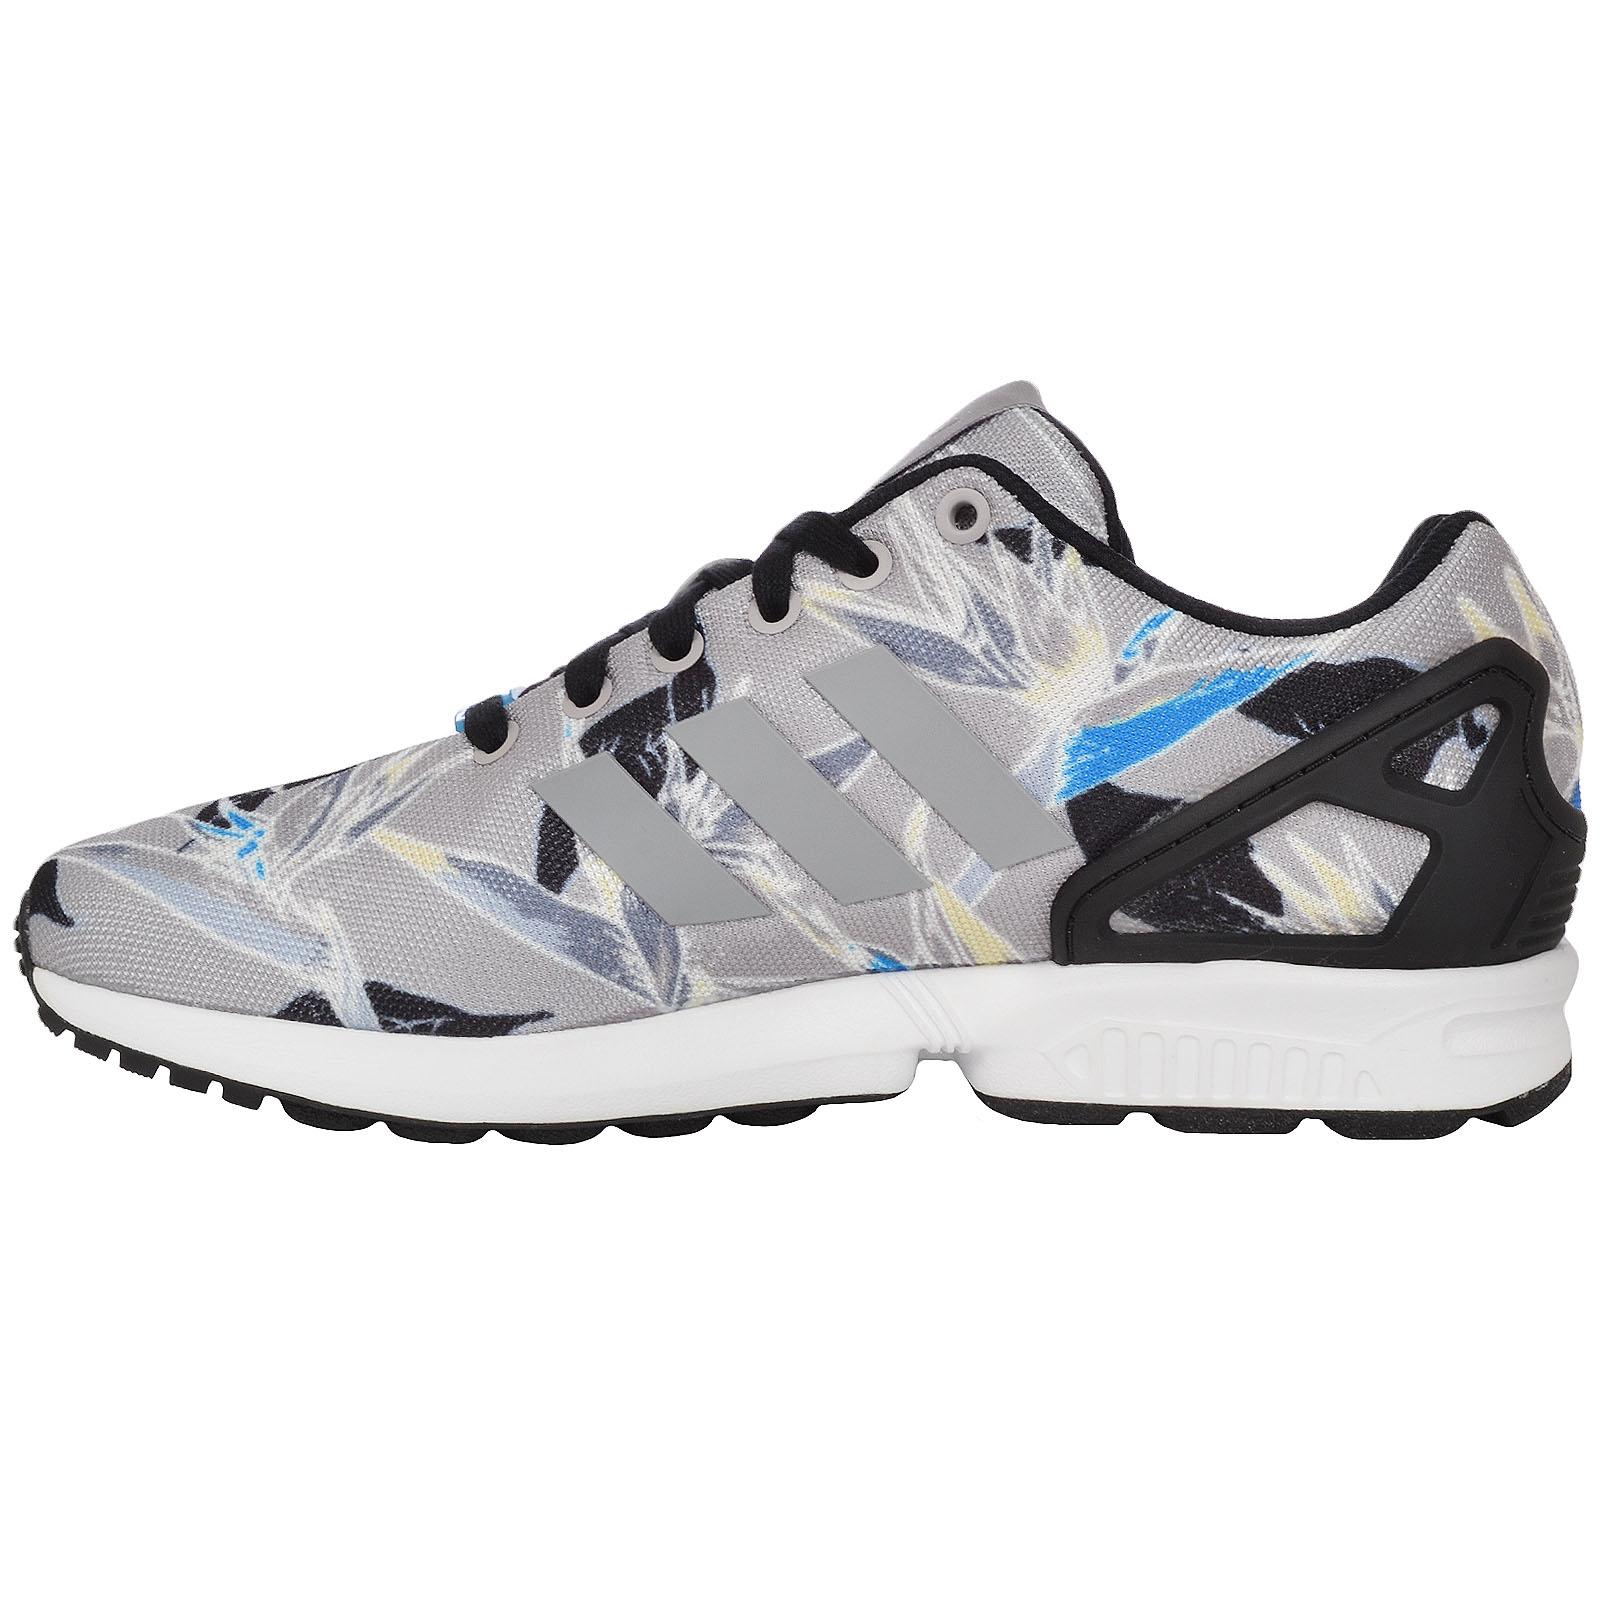 adidas-Originals-Mens-Torsion-ZX-Flux-Gym-Fitness-